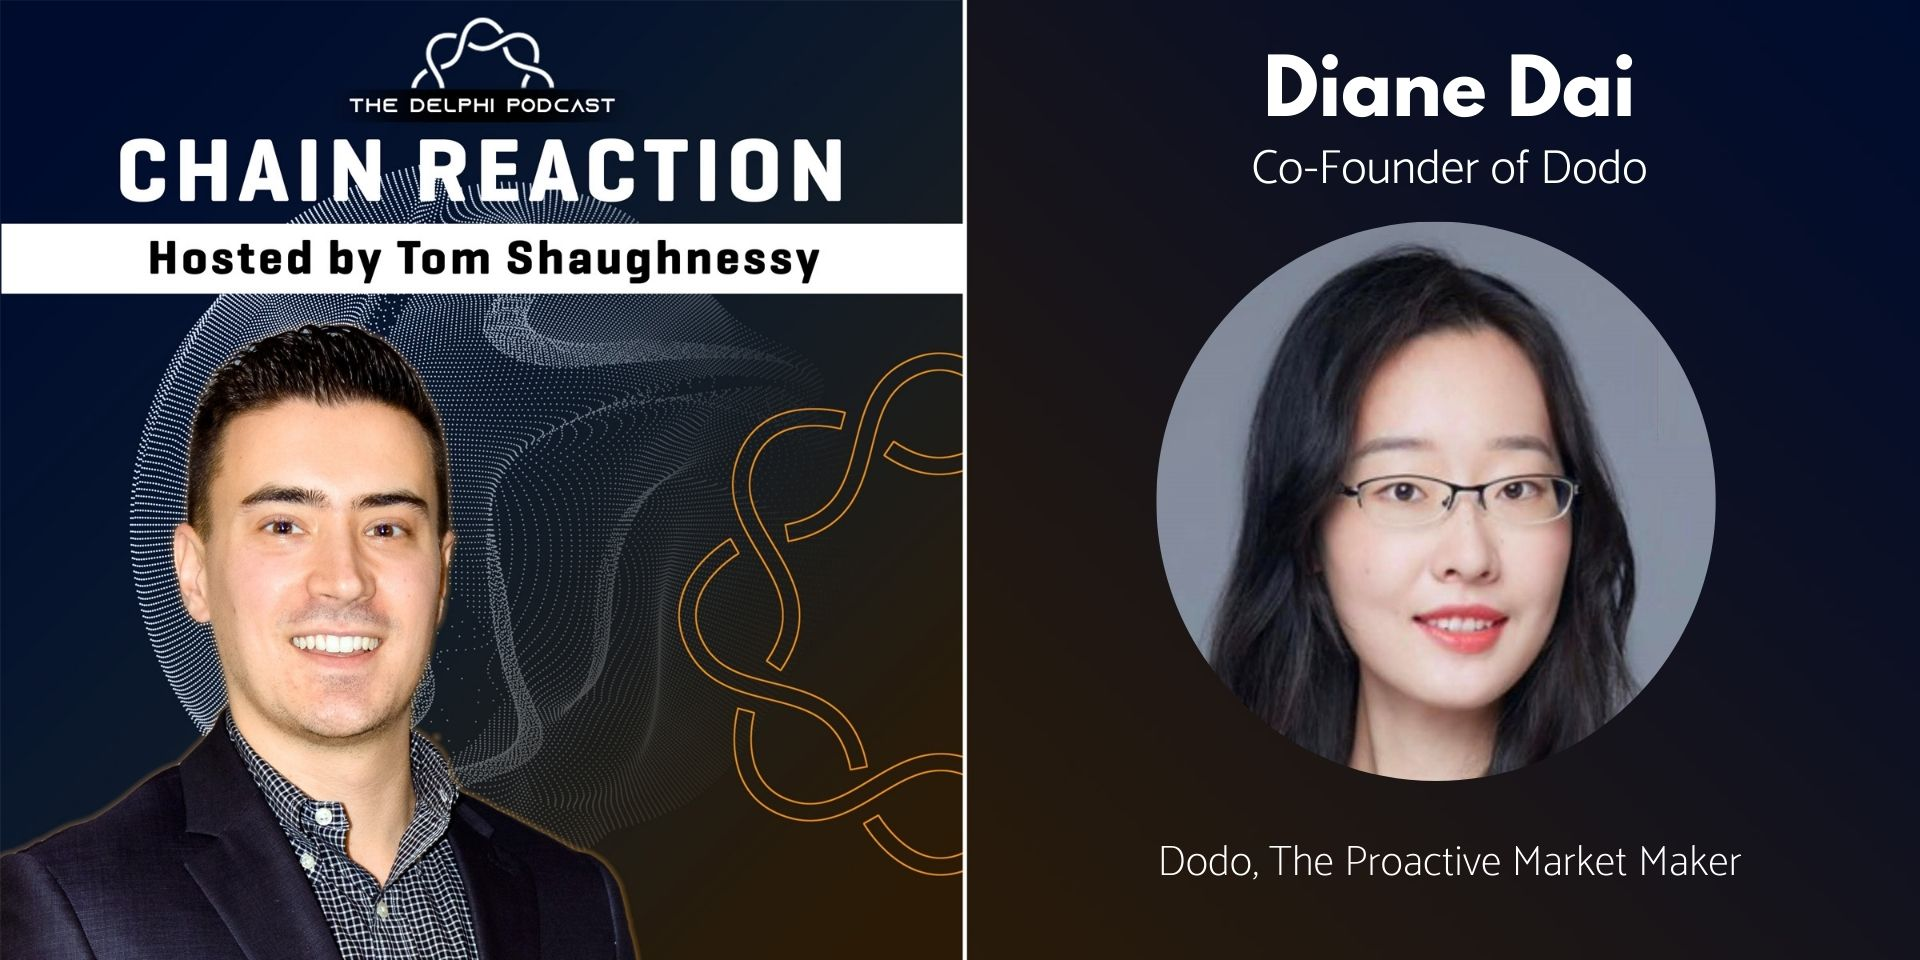 Diane Dai: DODO The Proactive Market Maker 🐣